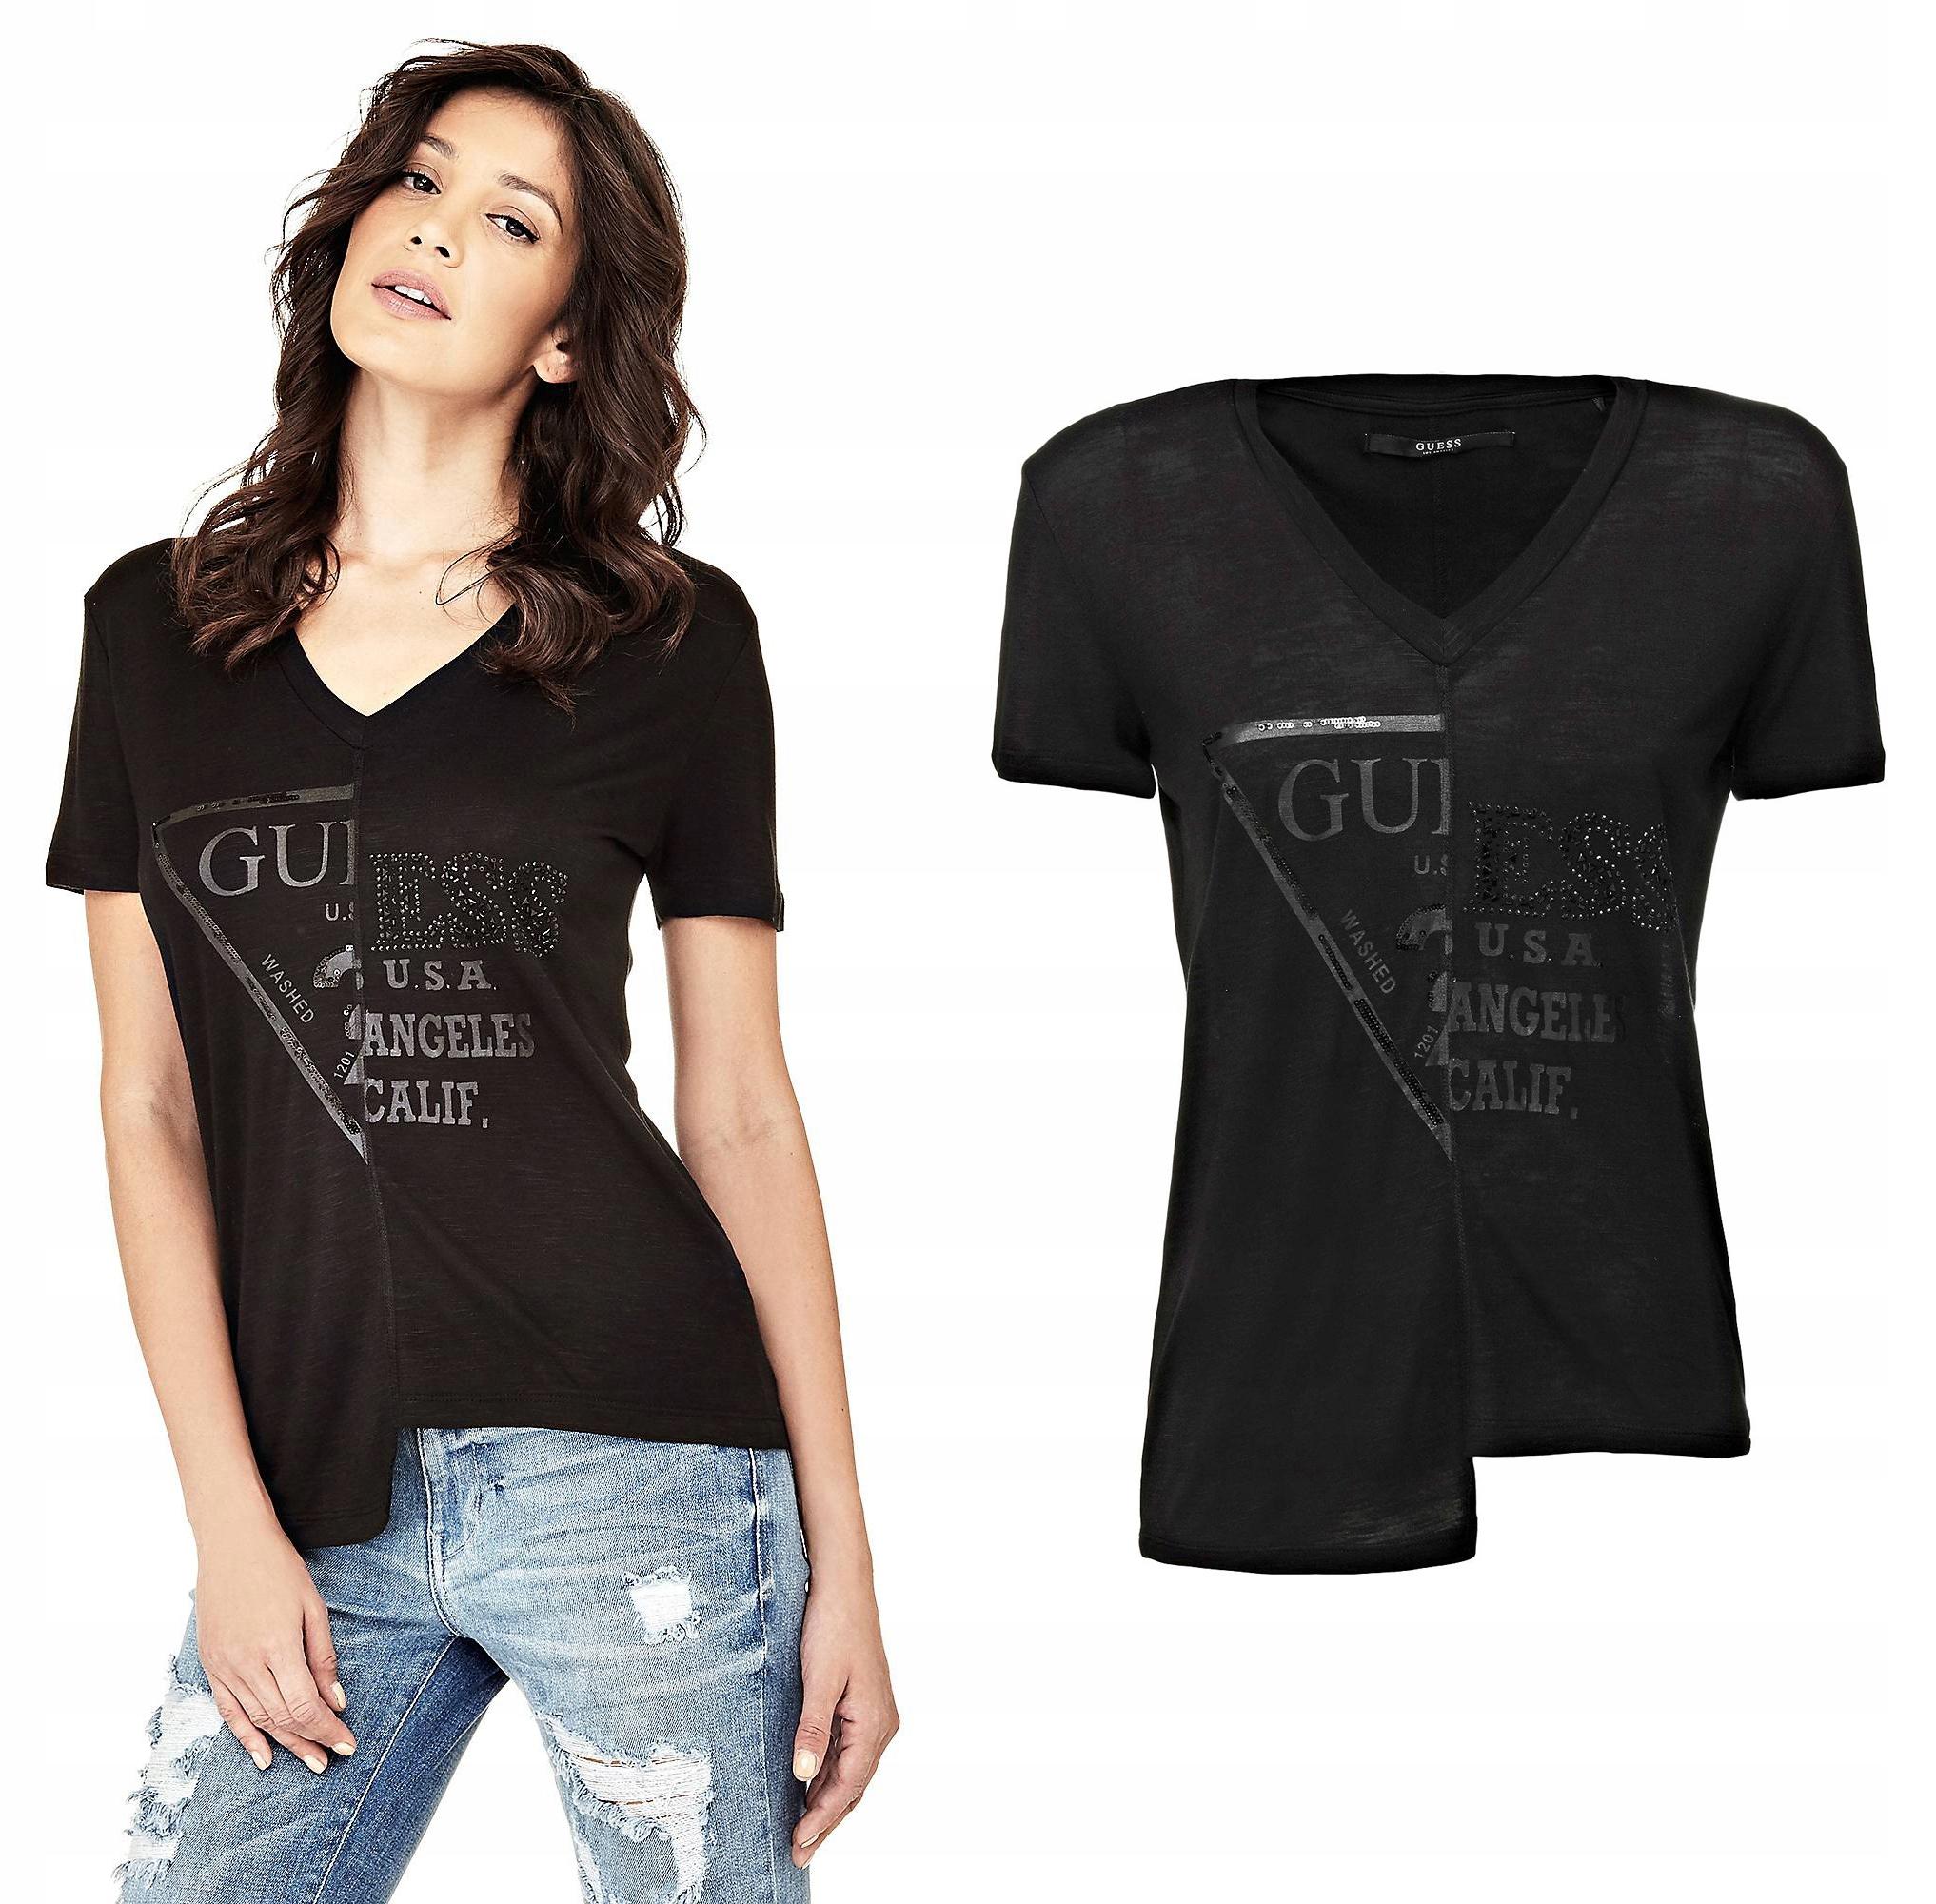 Guess koszulka t-shirt czarna bawełna logo Xs